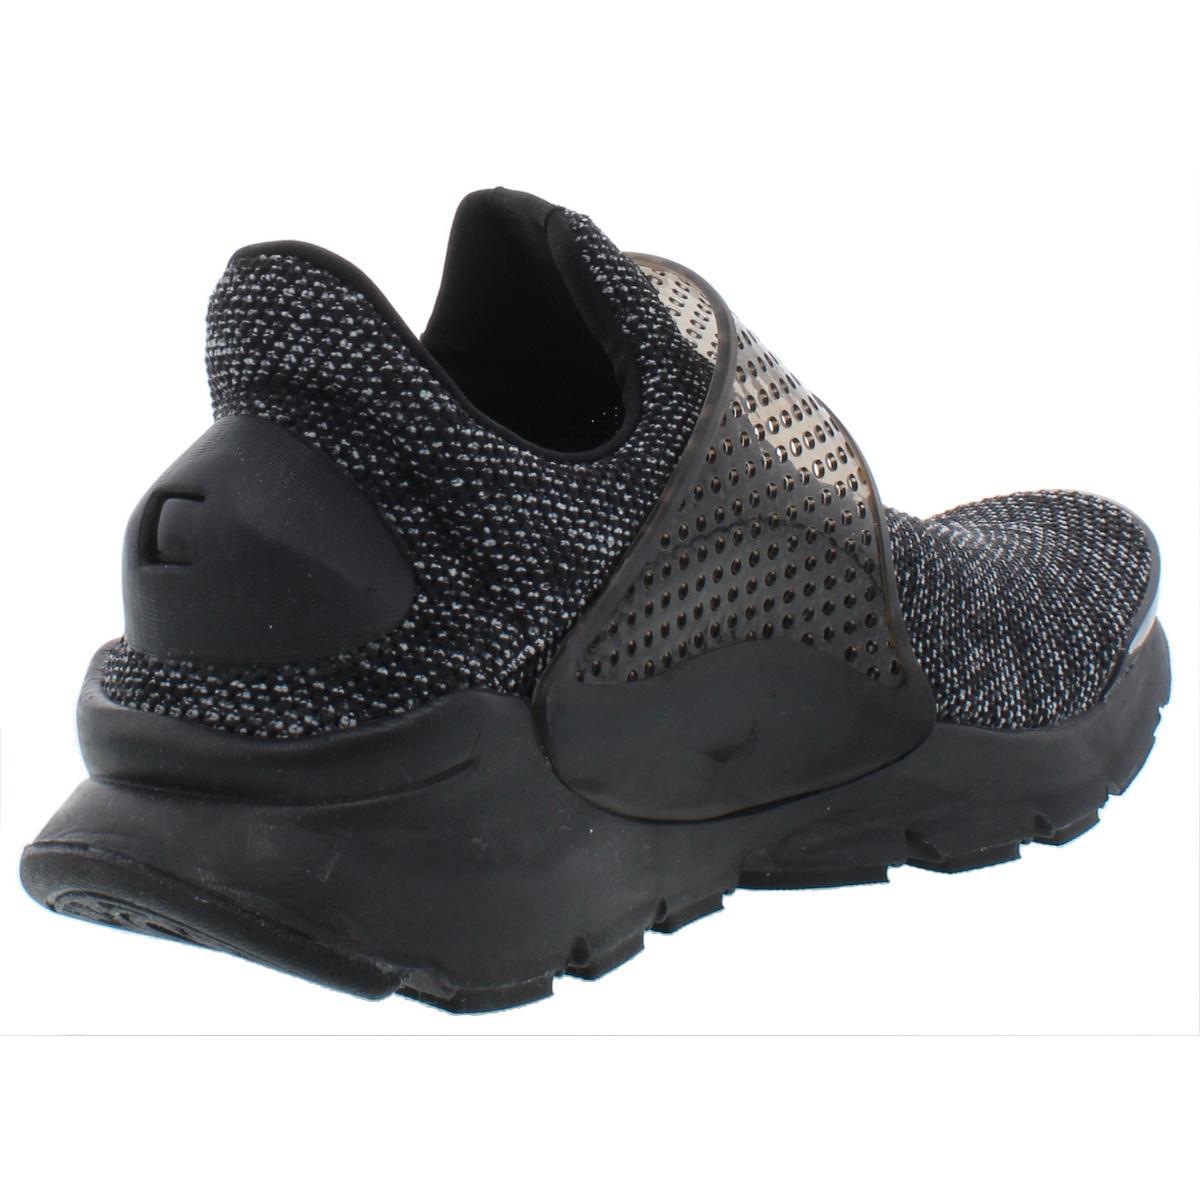 best loved 97aca 210ab Nike Sock Dart BR Breathe Mens 909551-001 Black Slip on Running Shoes Size  8 for sale online | eBay